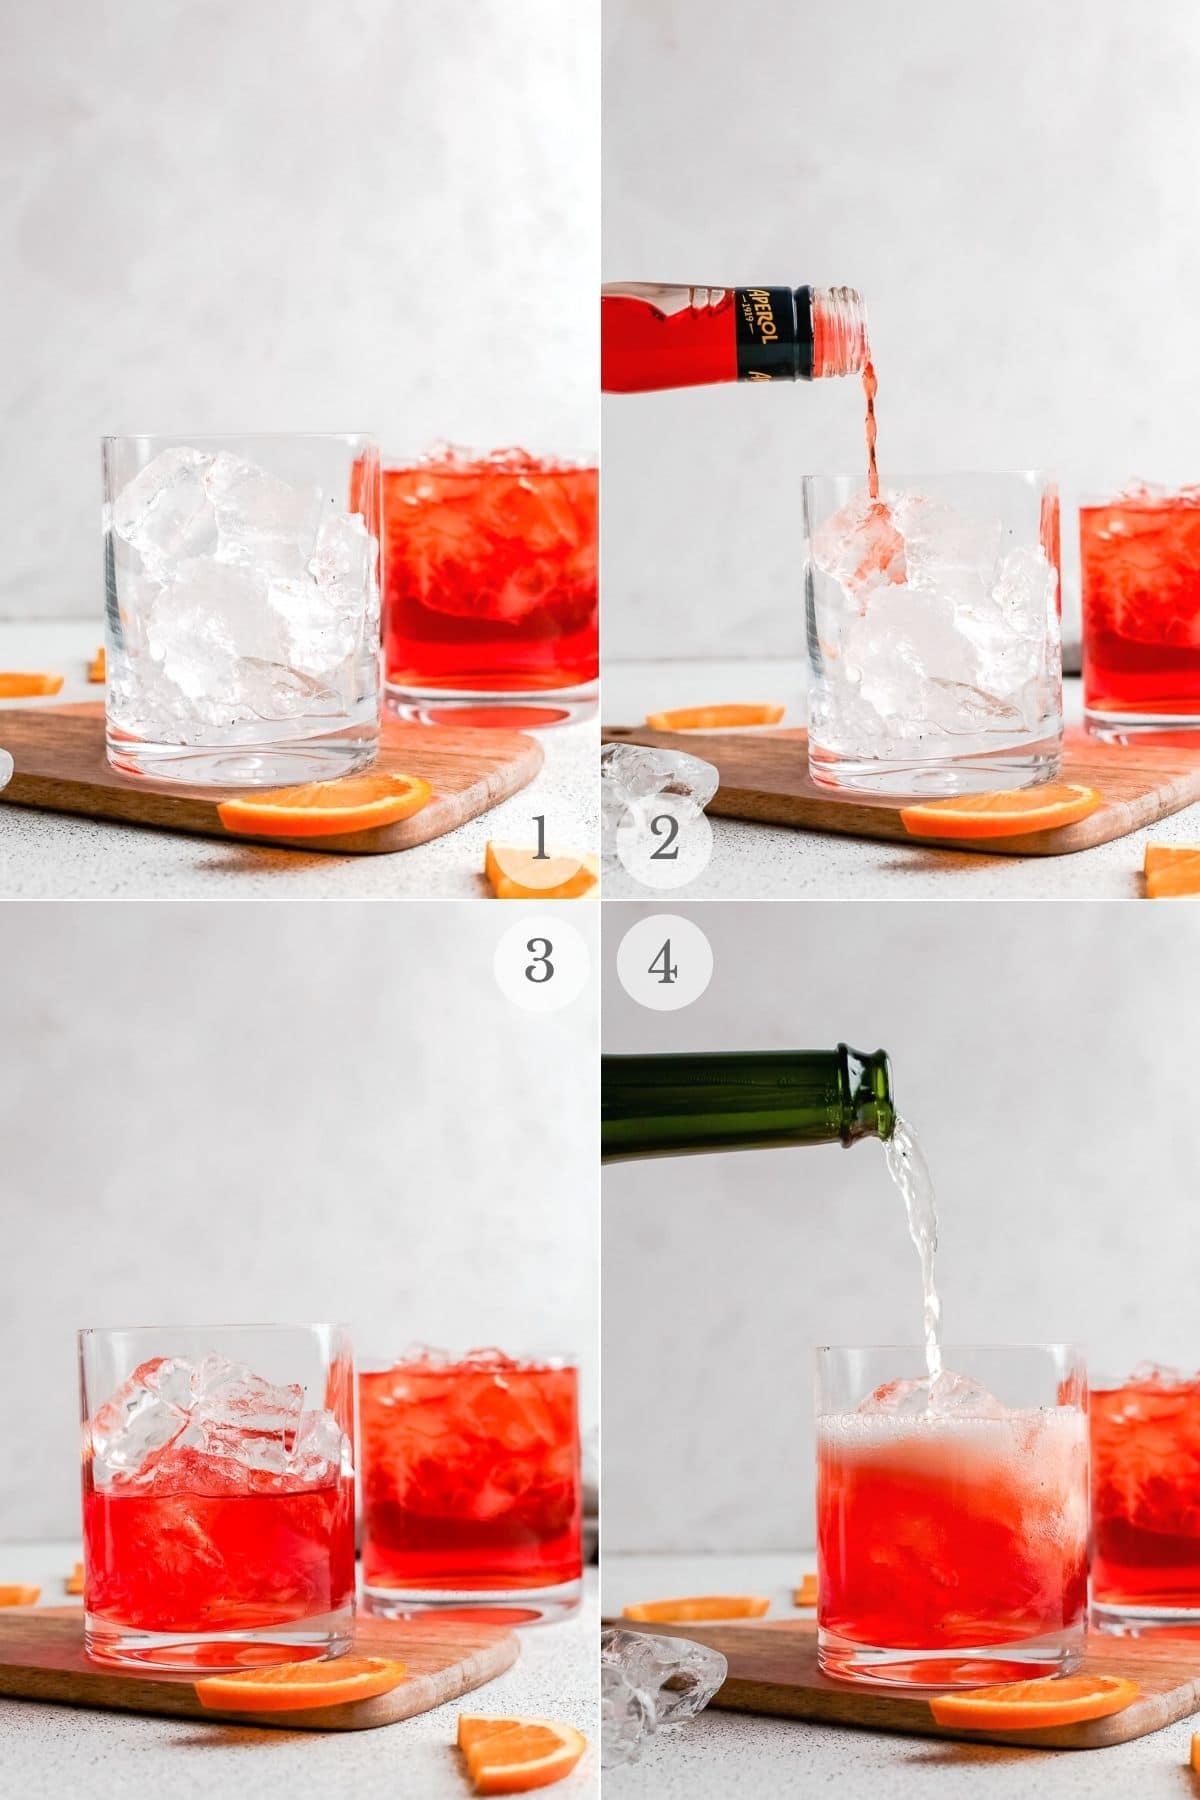 aperol spritz recipe steps 1-4